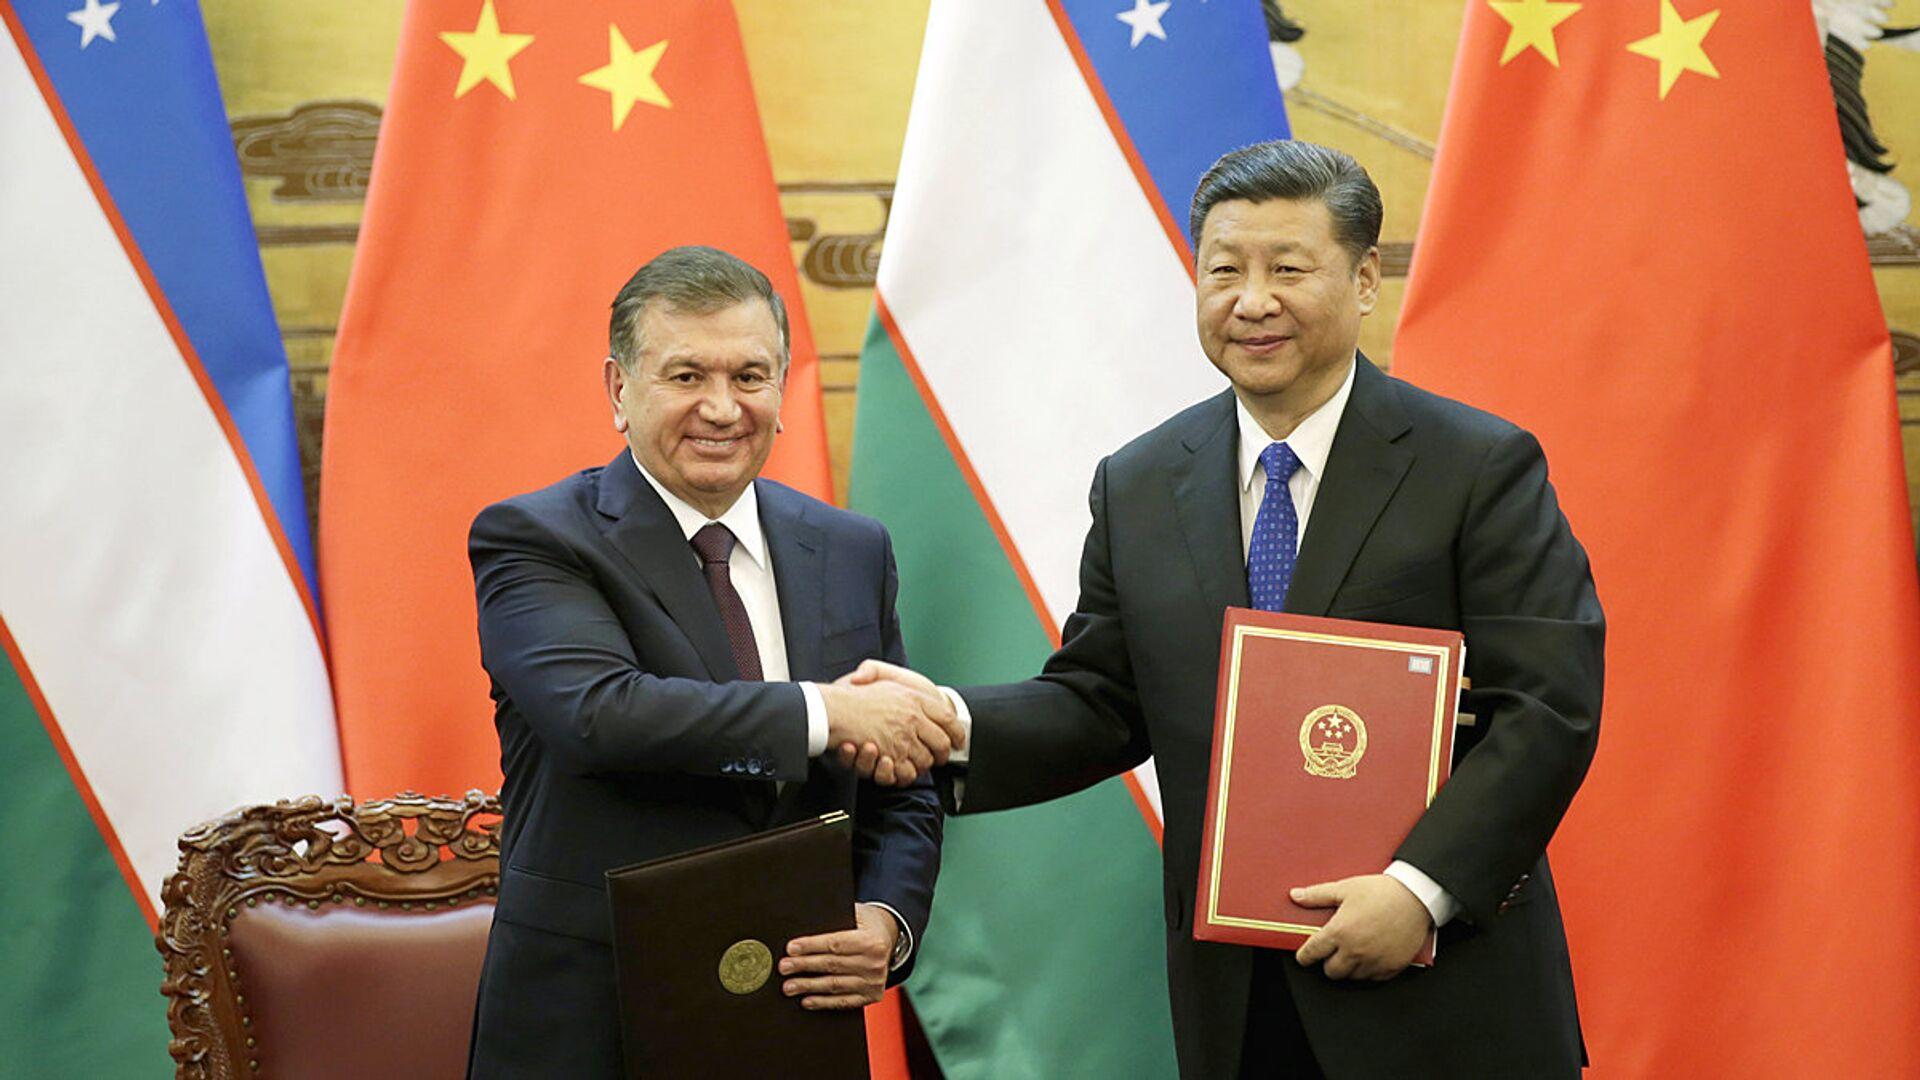 Председатель КНР Си Цзиньпин и президент Узбекистана Шавкат Мирзиёев - Sputnik Узбекистан, 1920, 01.10.2021